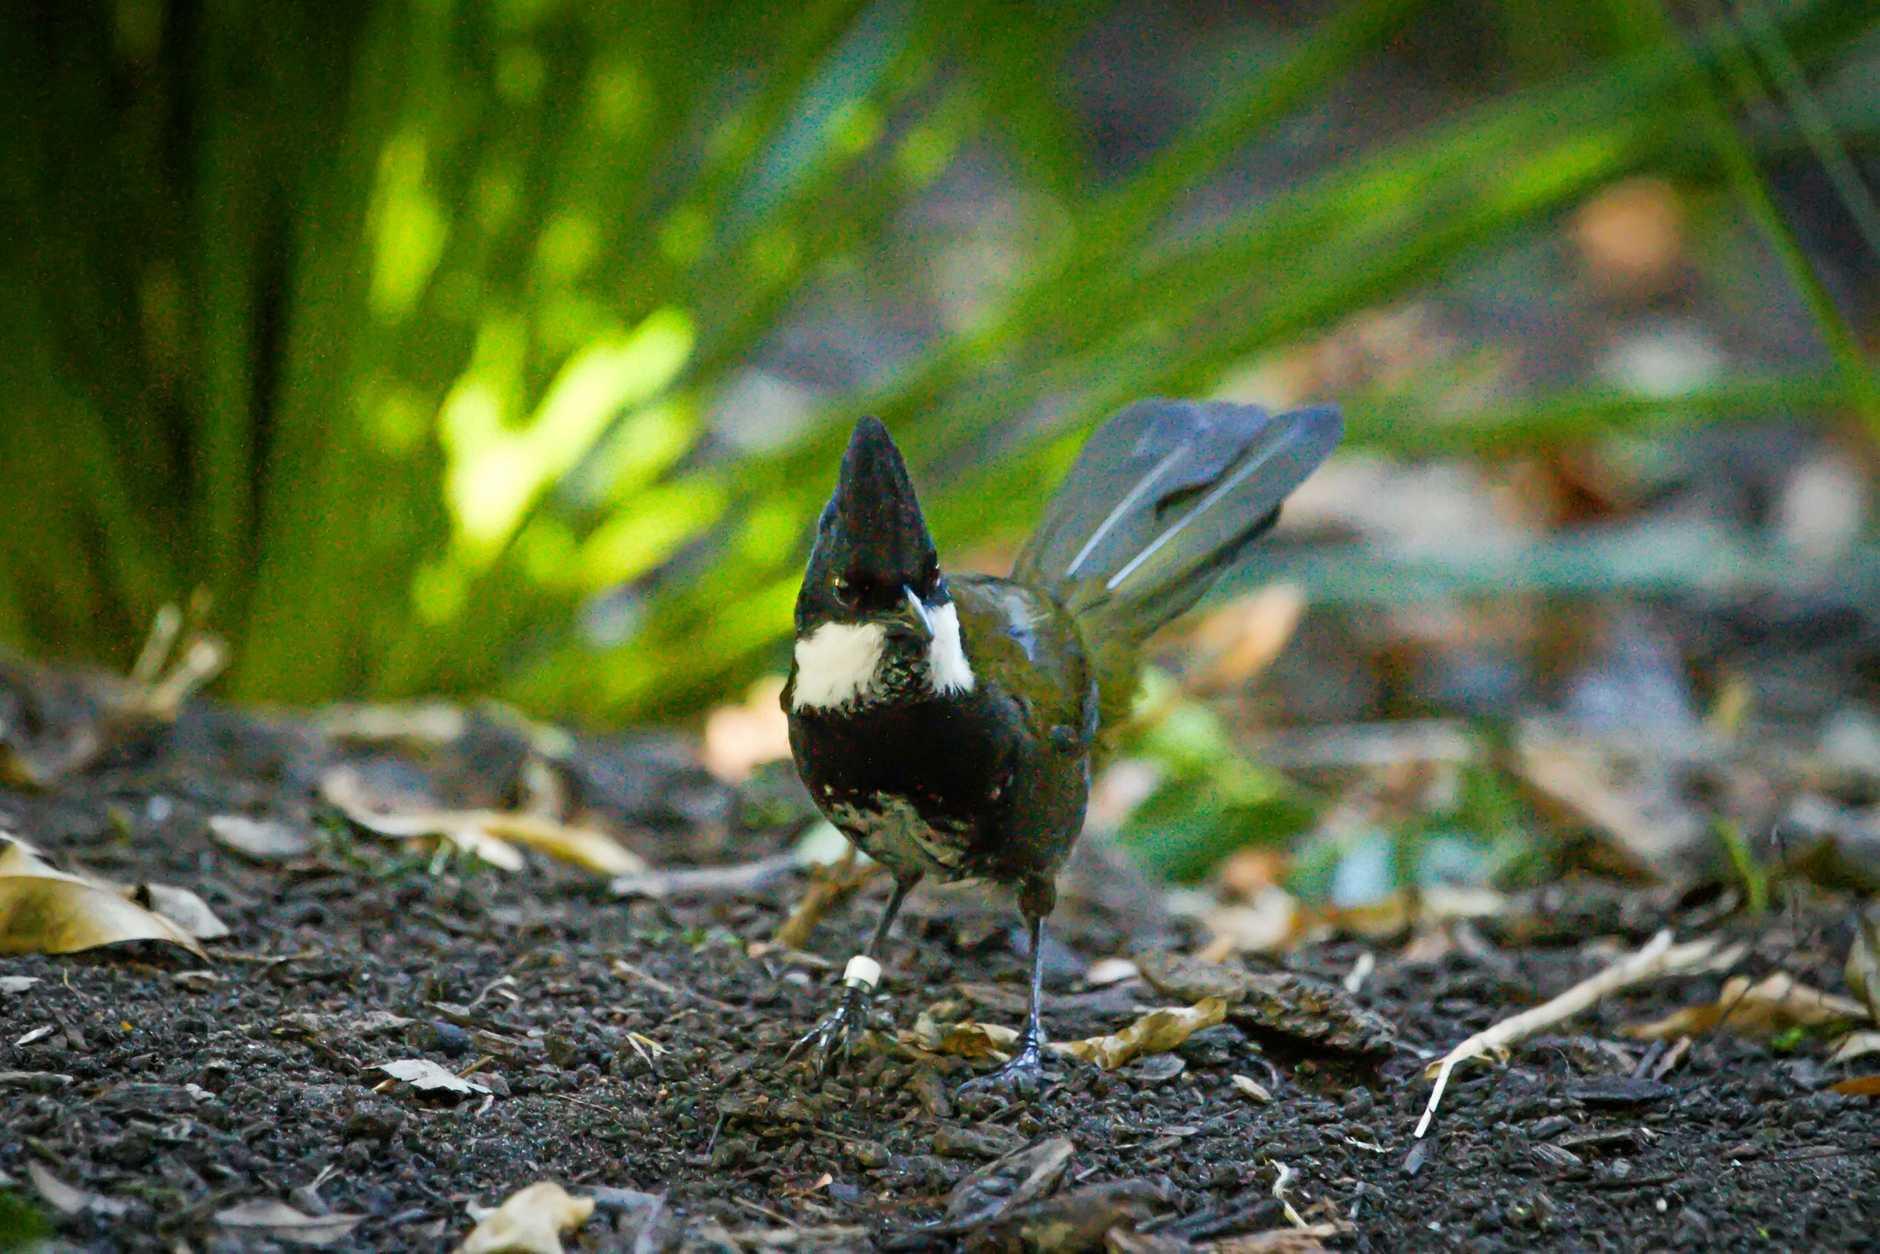 The new Whip bird at the Rockhampton Zoo.